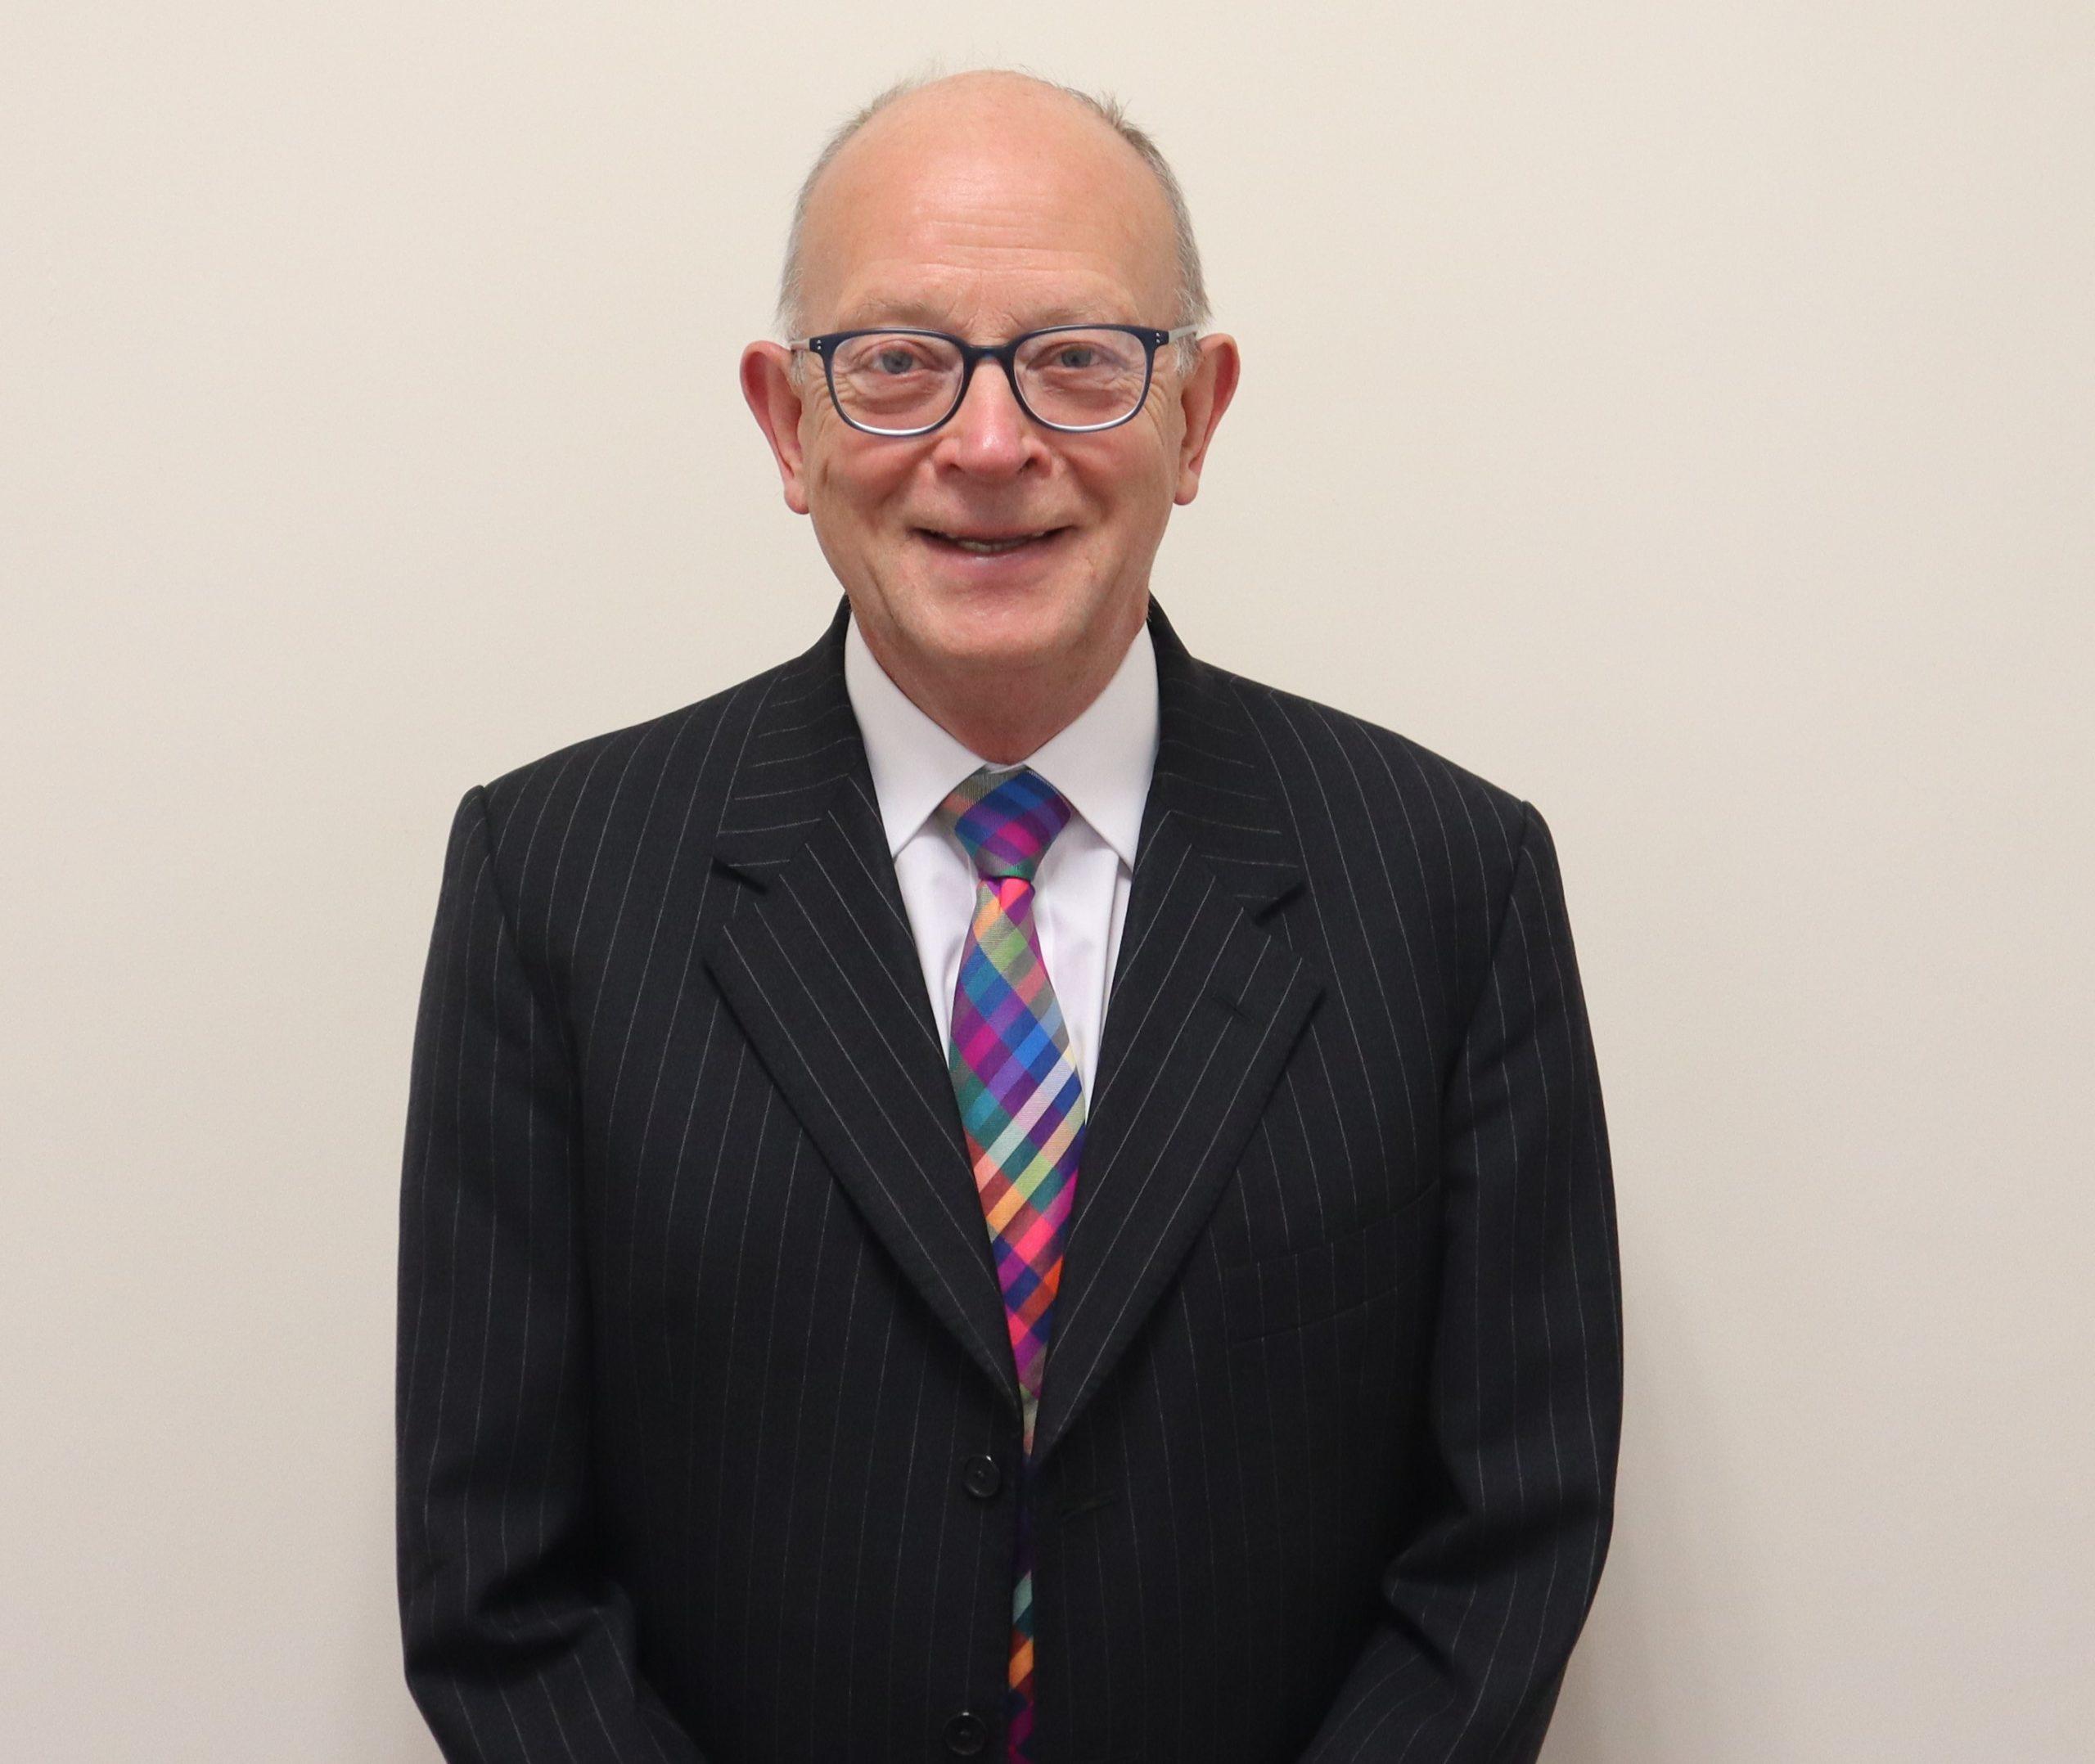 Ken Jarrold CBE